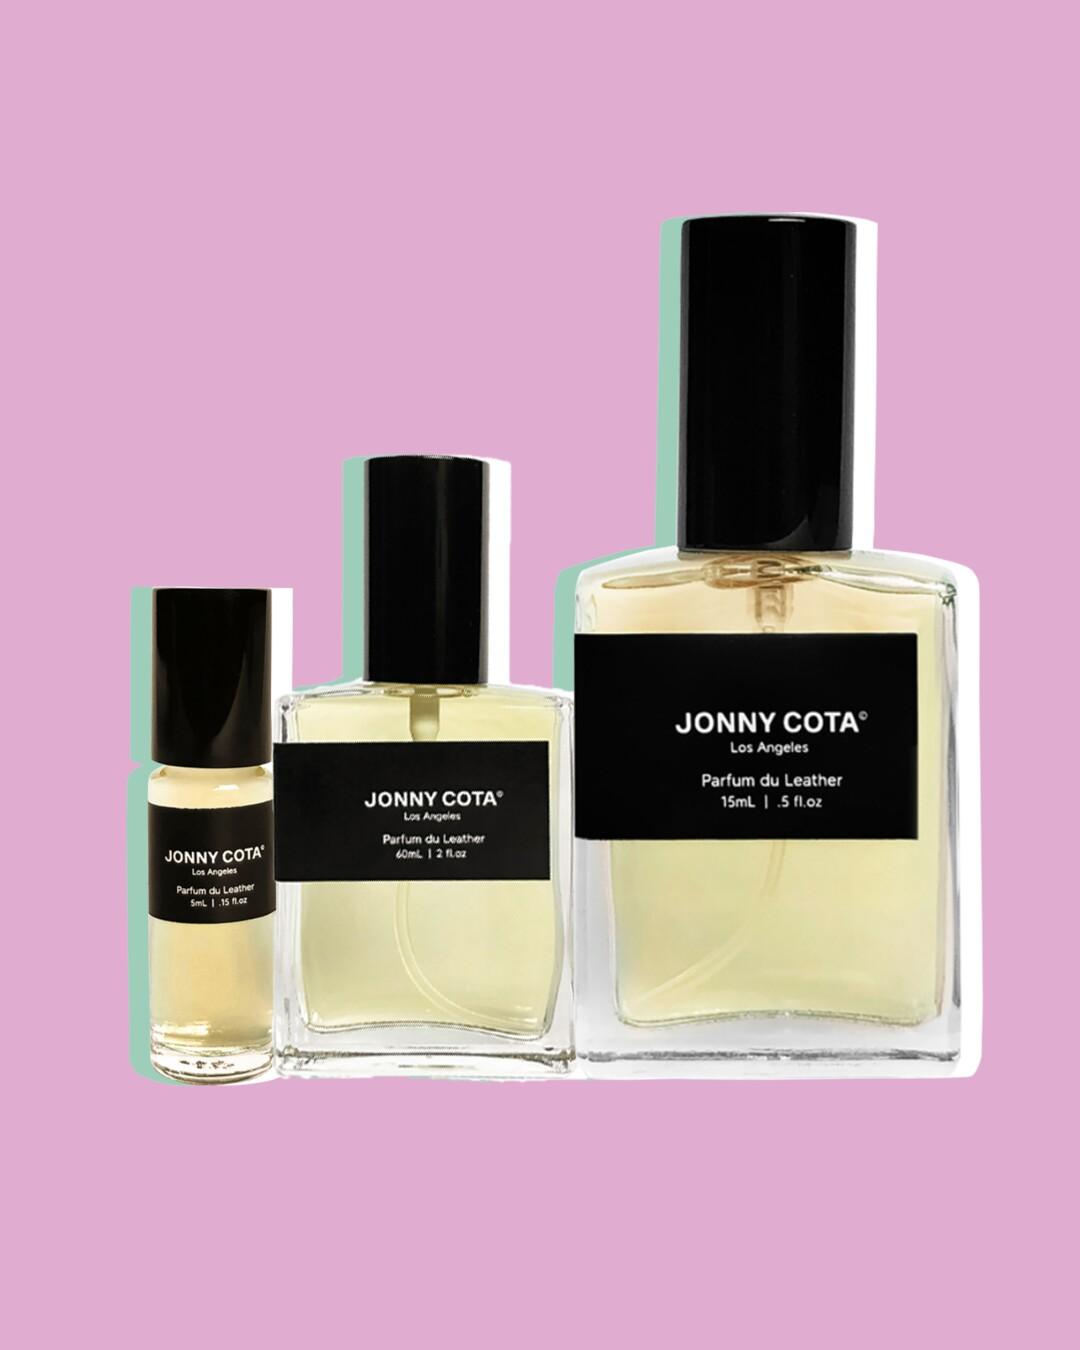 Jonny Cota perfume in three different sizes